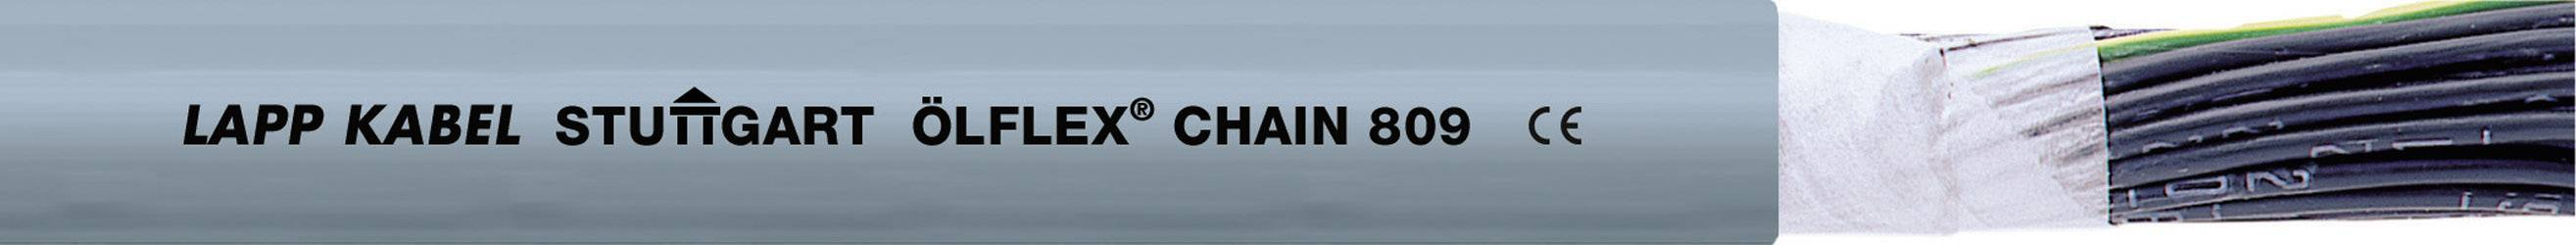 Žíla kabelu LappKabel ÖLFLEX CHAIN 809 12G1,5 (1026729), 12x 1,5 mm², PVC, Ø 12,3 mm, 1 m, šedá